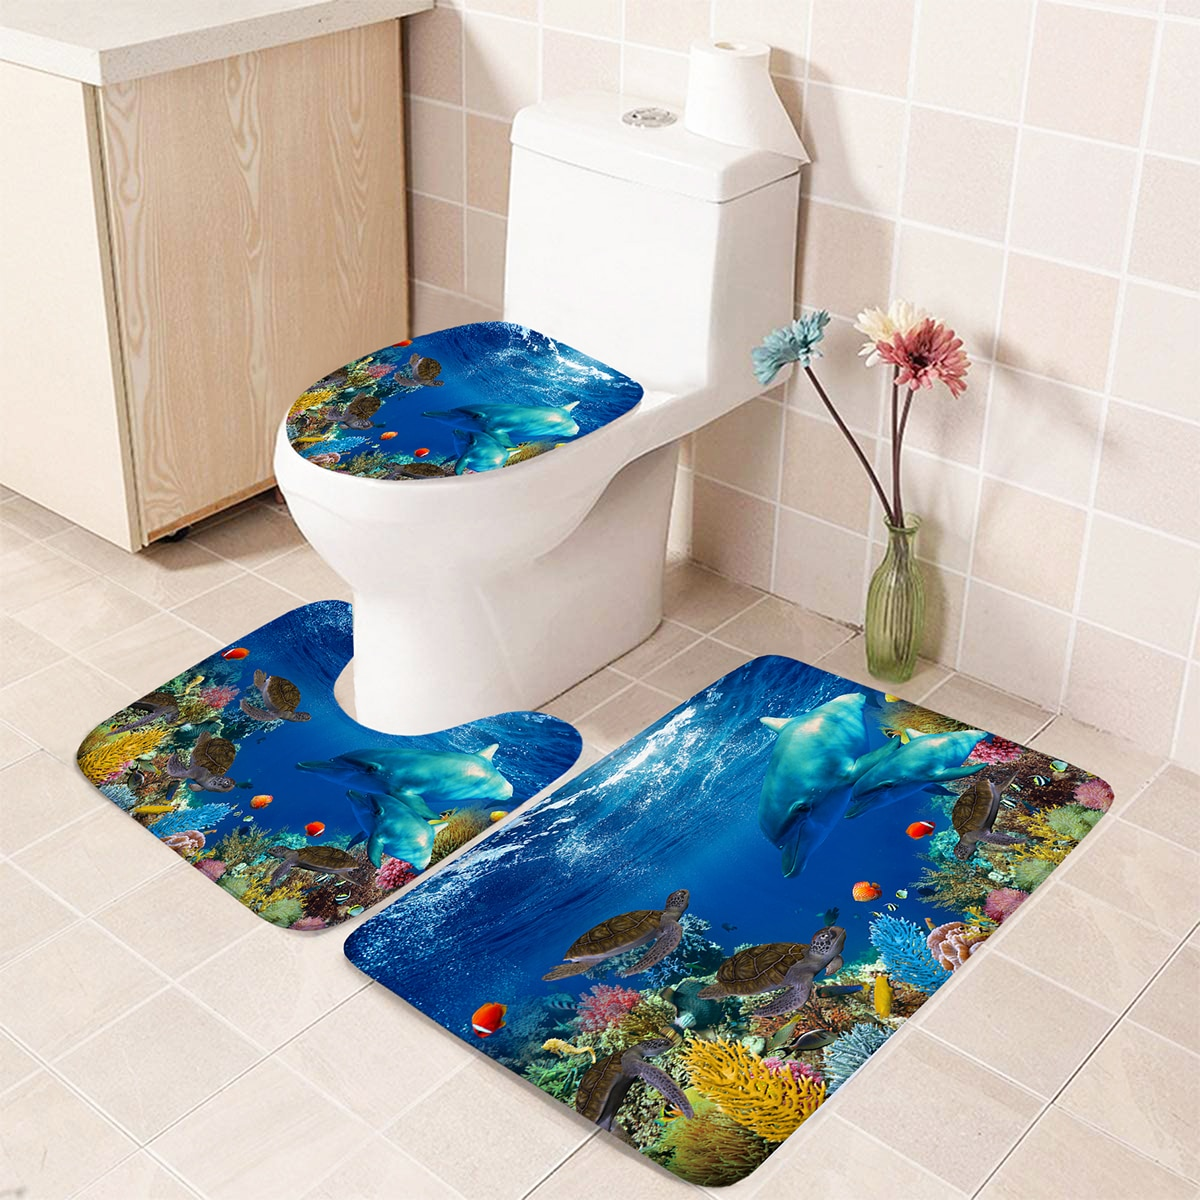 1 Stück Closestool Anti-Rutsch-Matte mit Meereslebewesen Muster